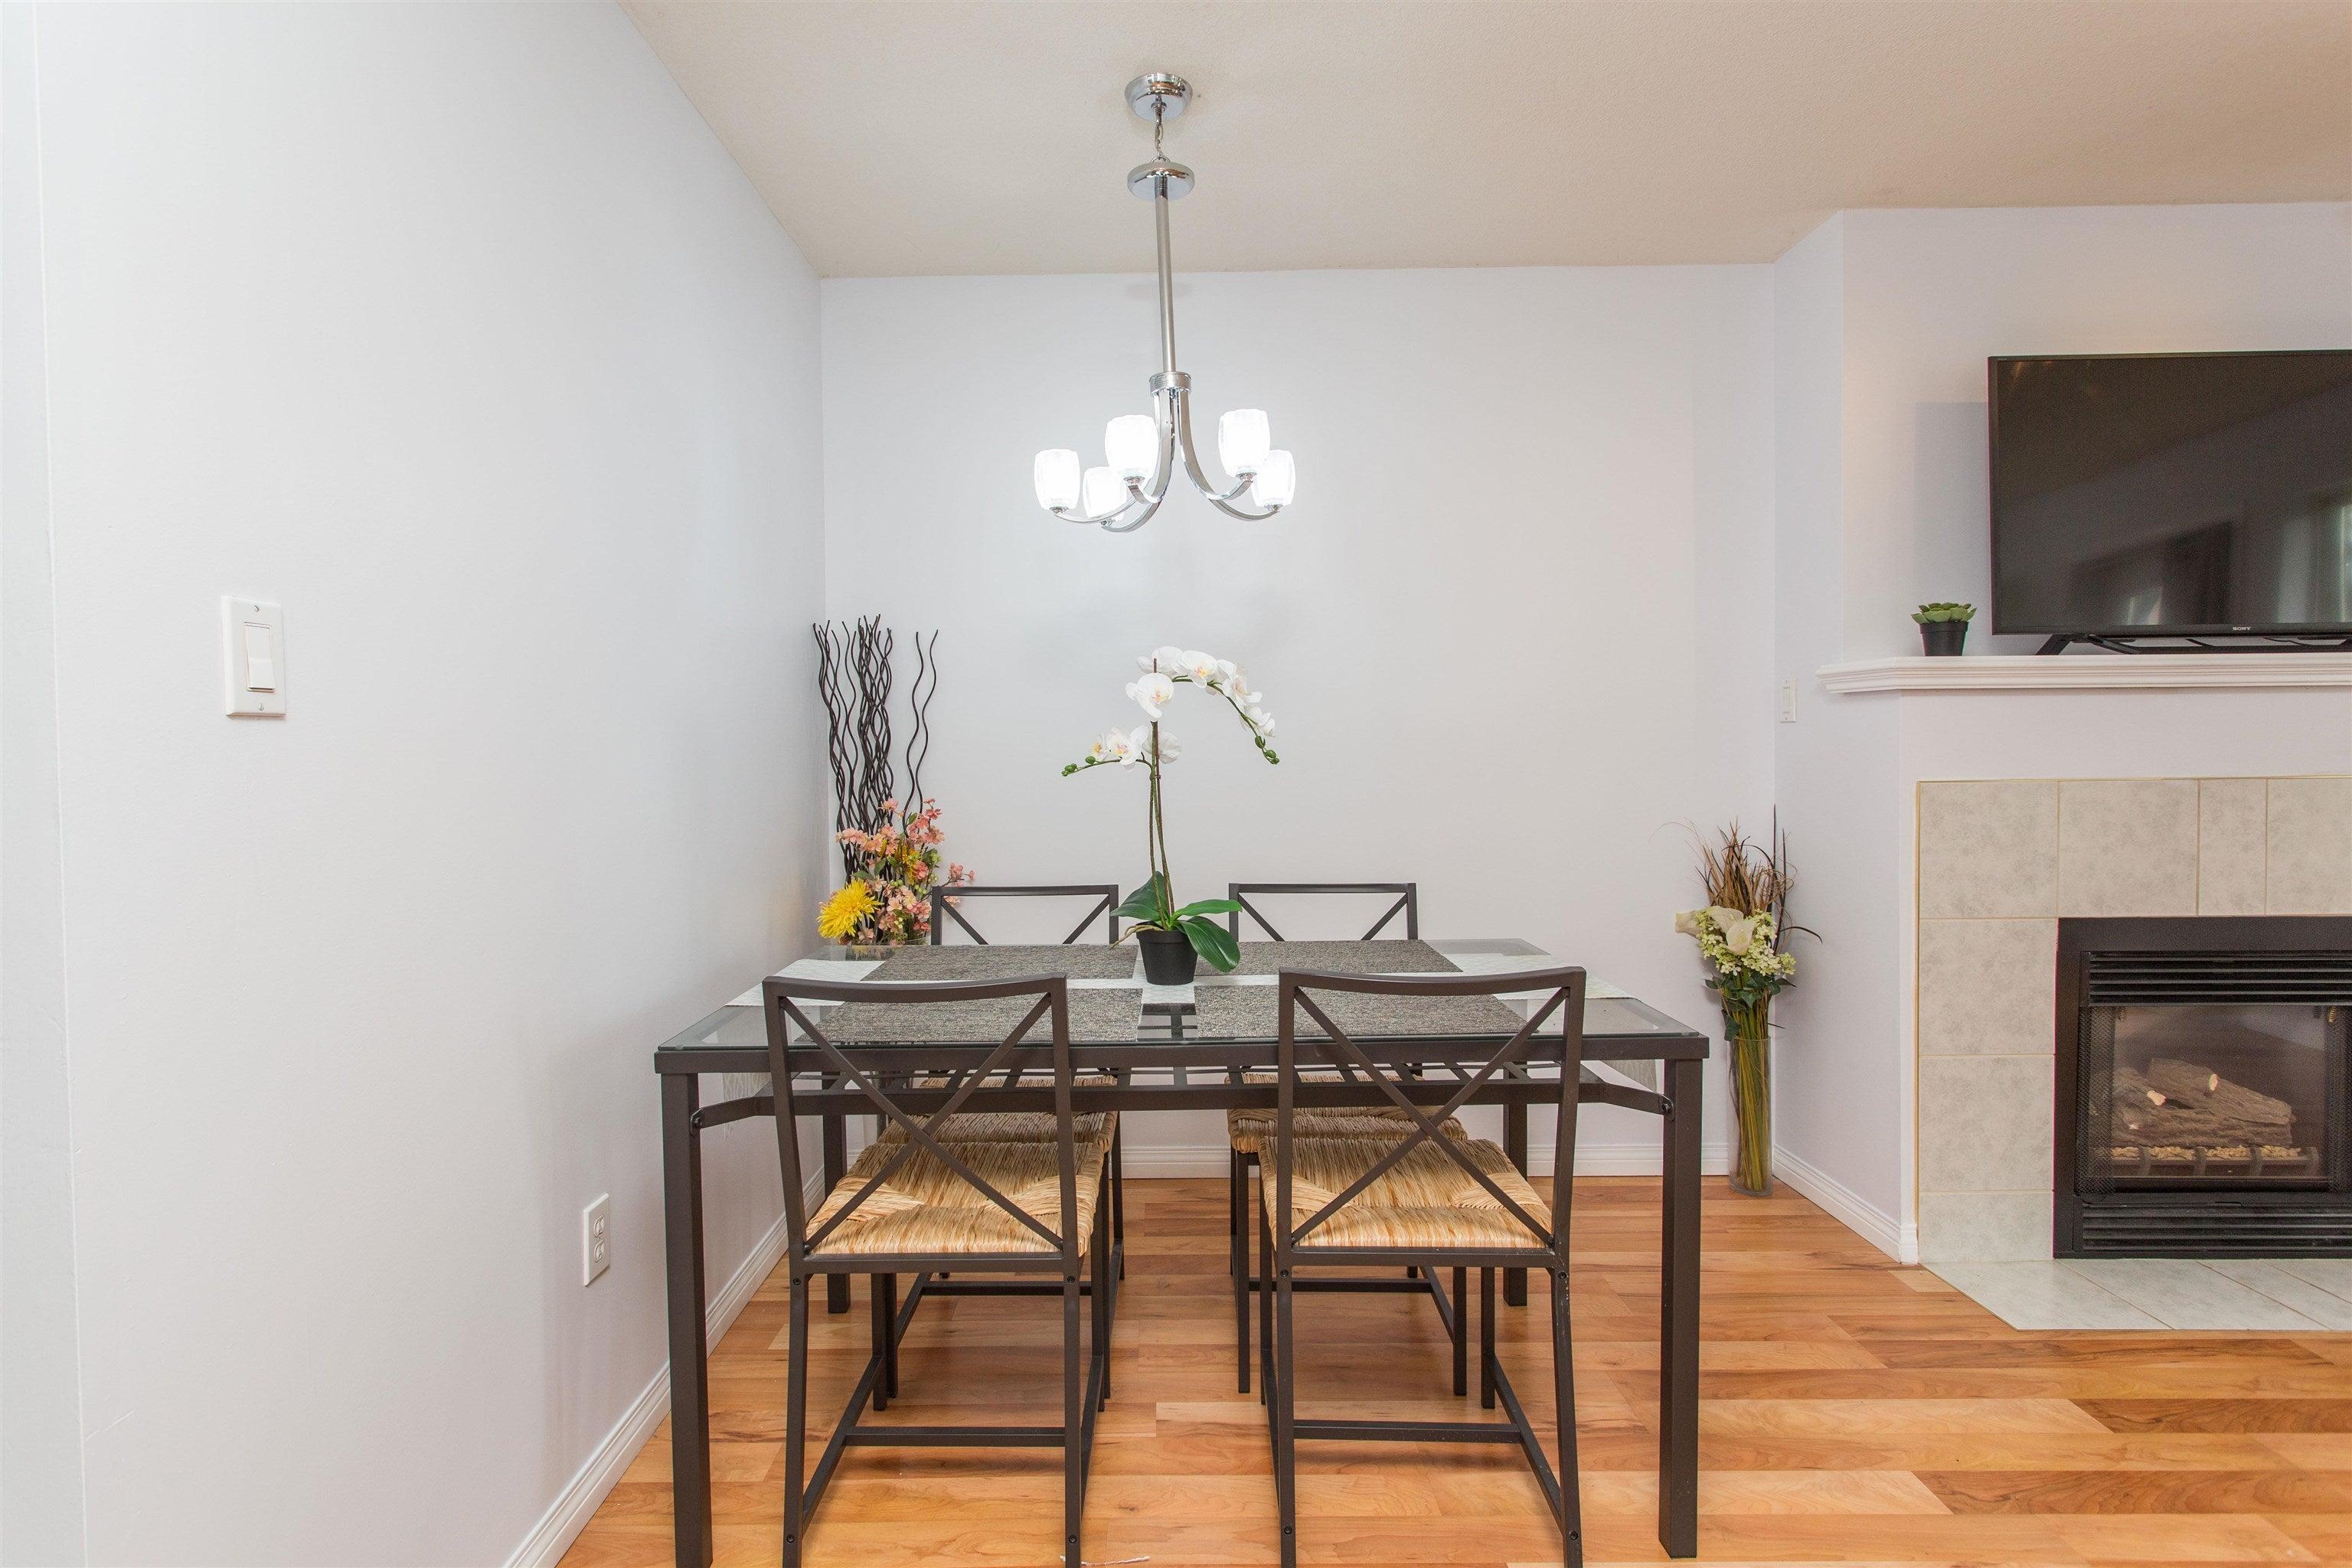 7 205 LEBLEU STREET - Maillardville Apartment/Condo for sale, 3 Bedrooms (R2625671) - #3